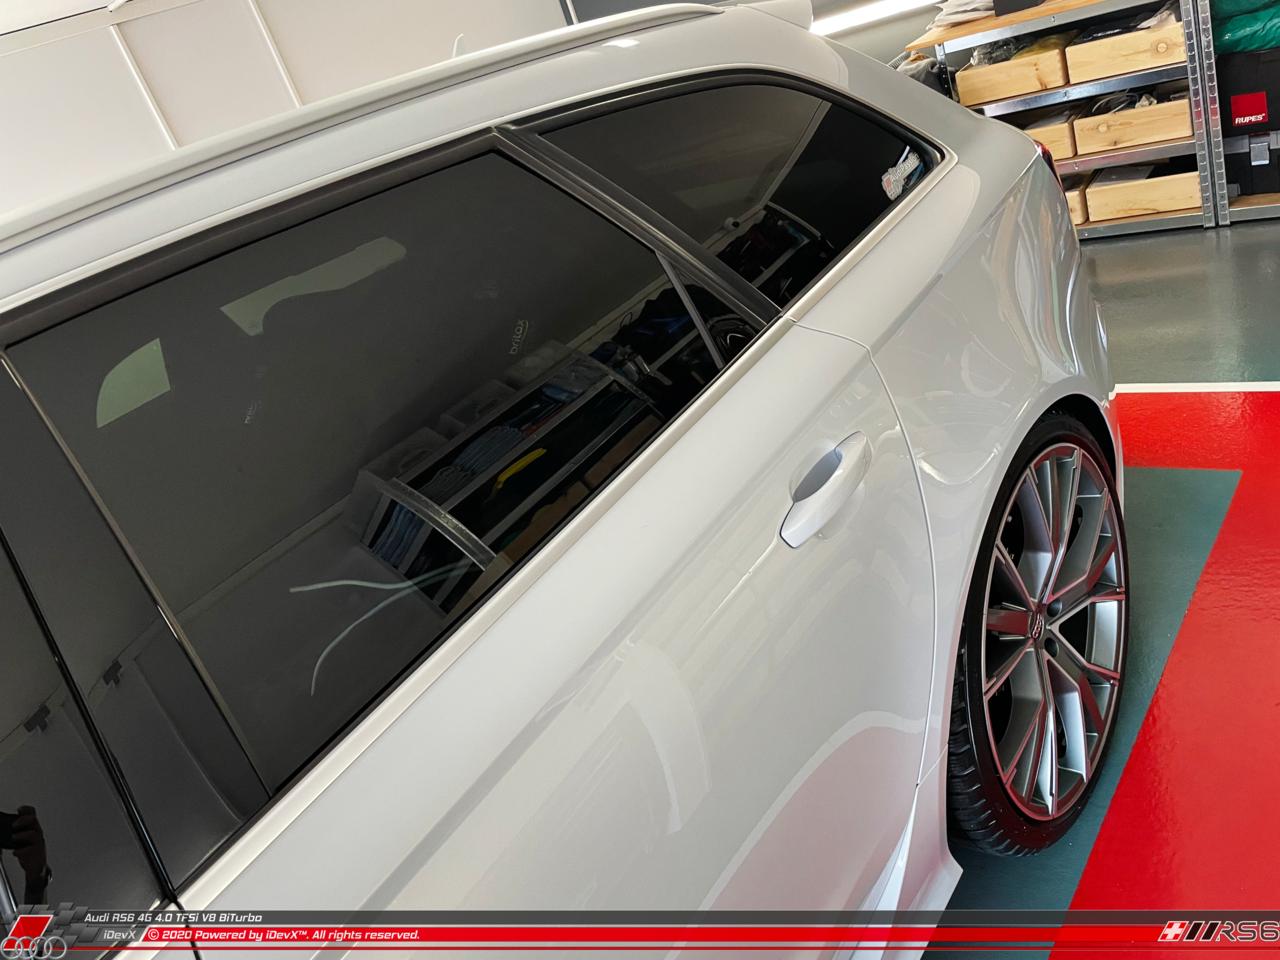 19.02.2021_Audi-RS6_iDevX_008.png